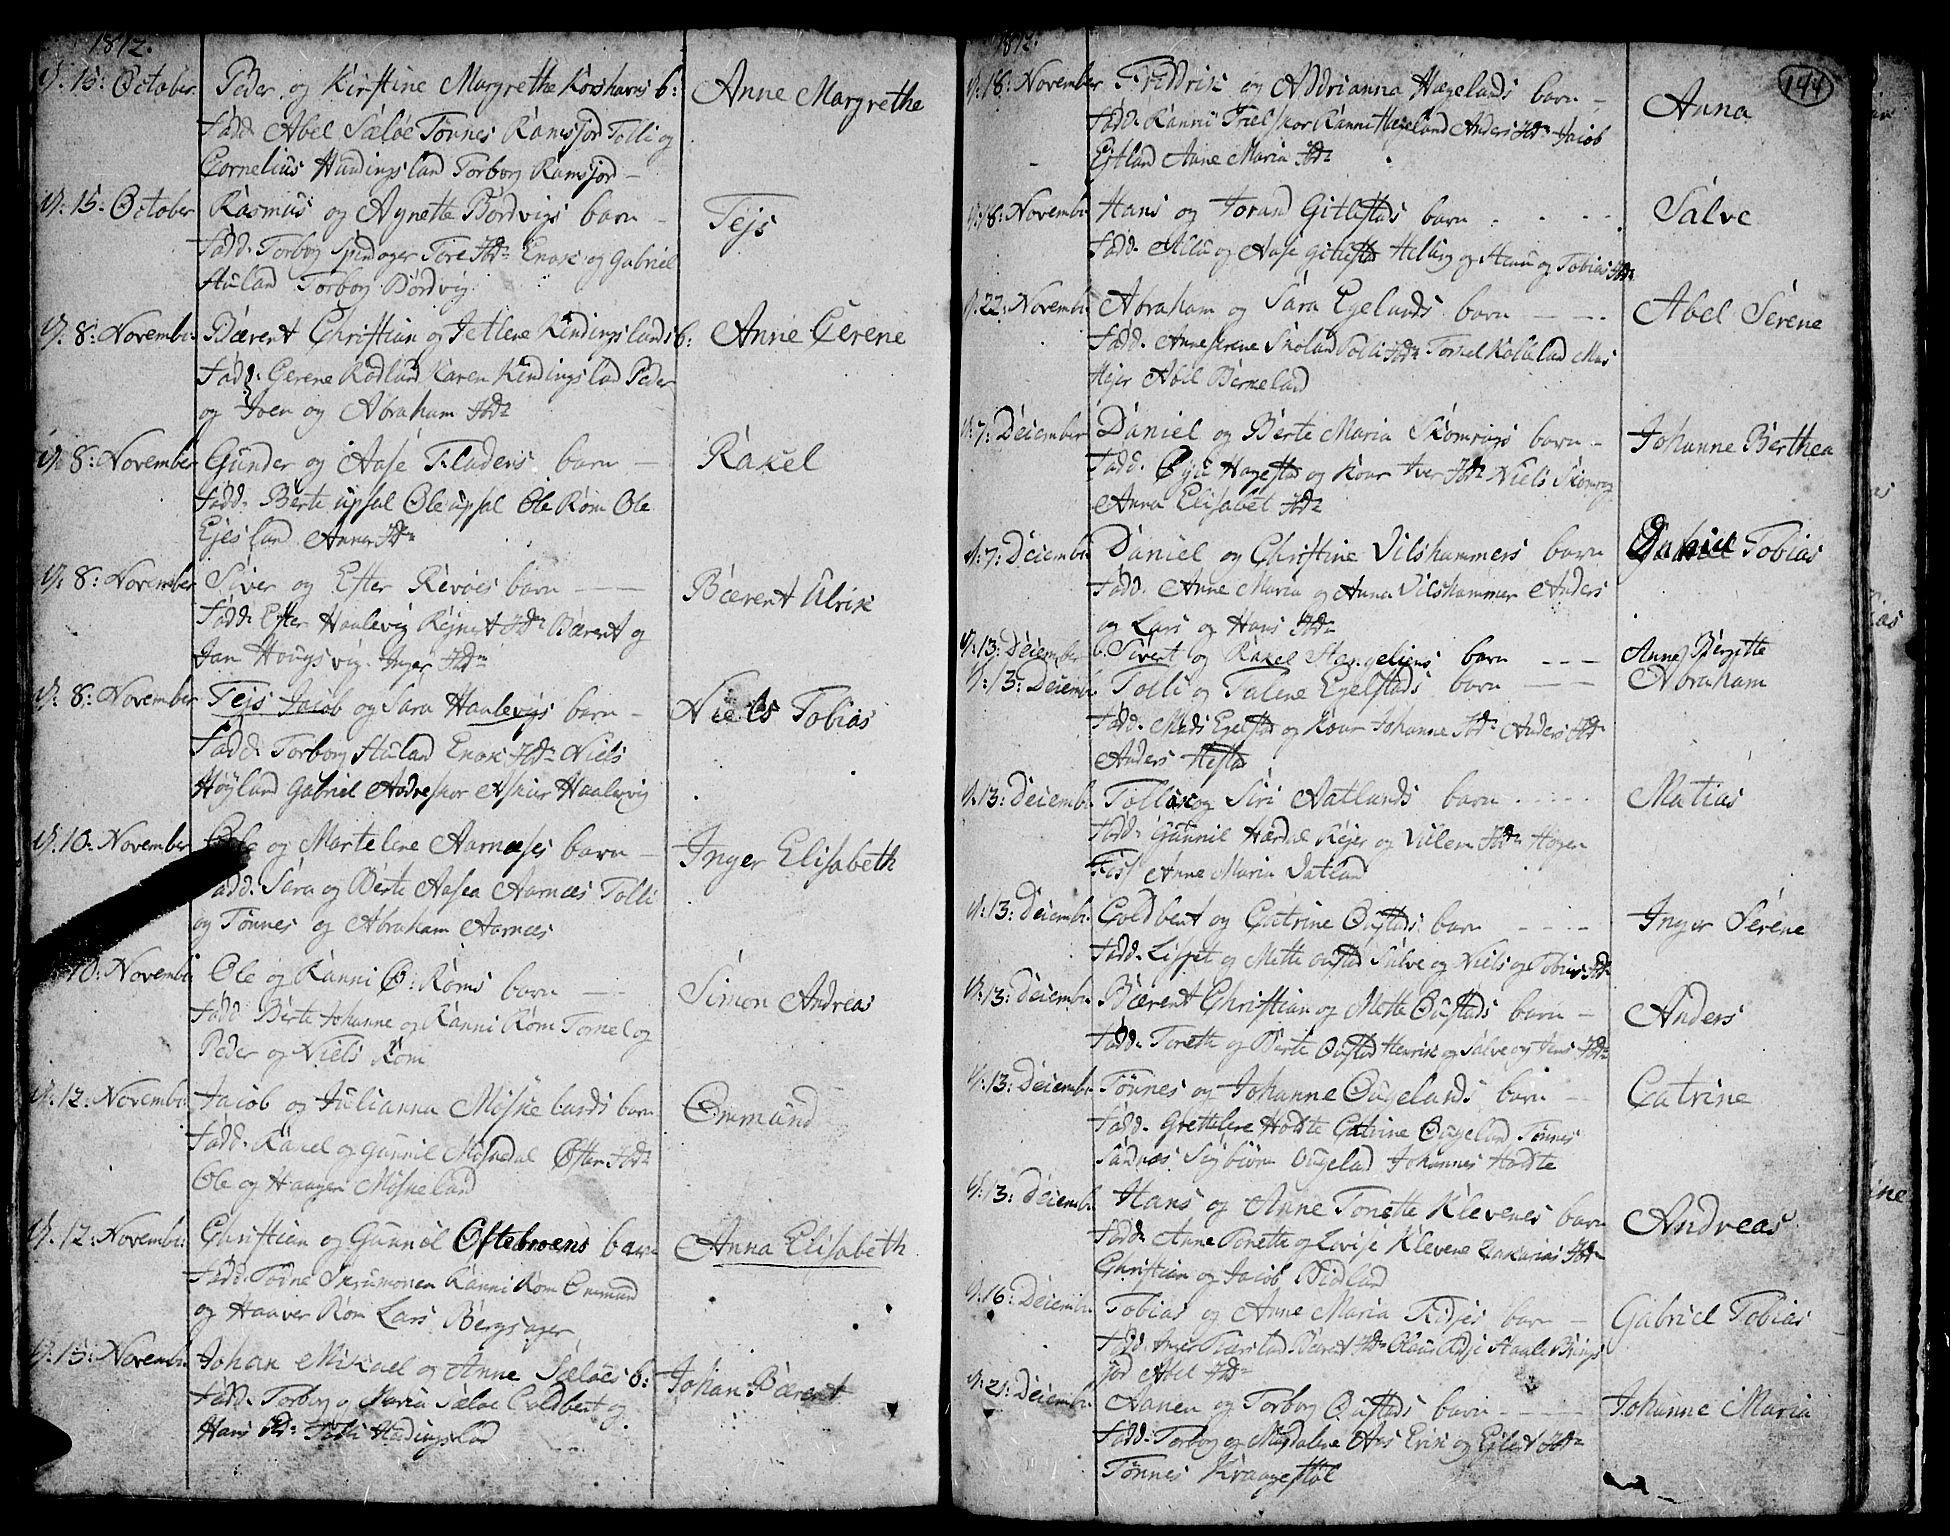 SAK, Lyngdal sokneprestkontor, F/Fa/Fac/L0004: Ministerialbok nr. A 4, 1780-1815, s. 144